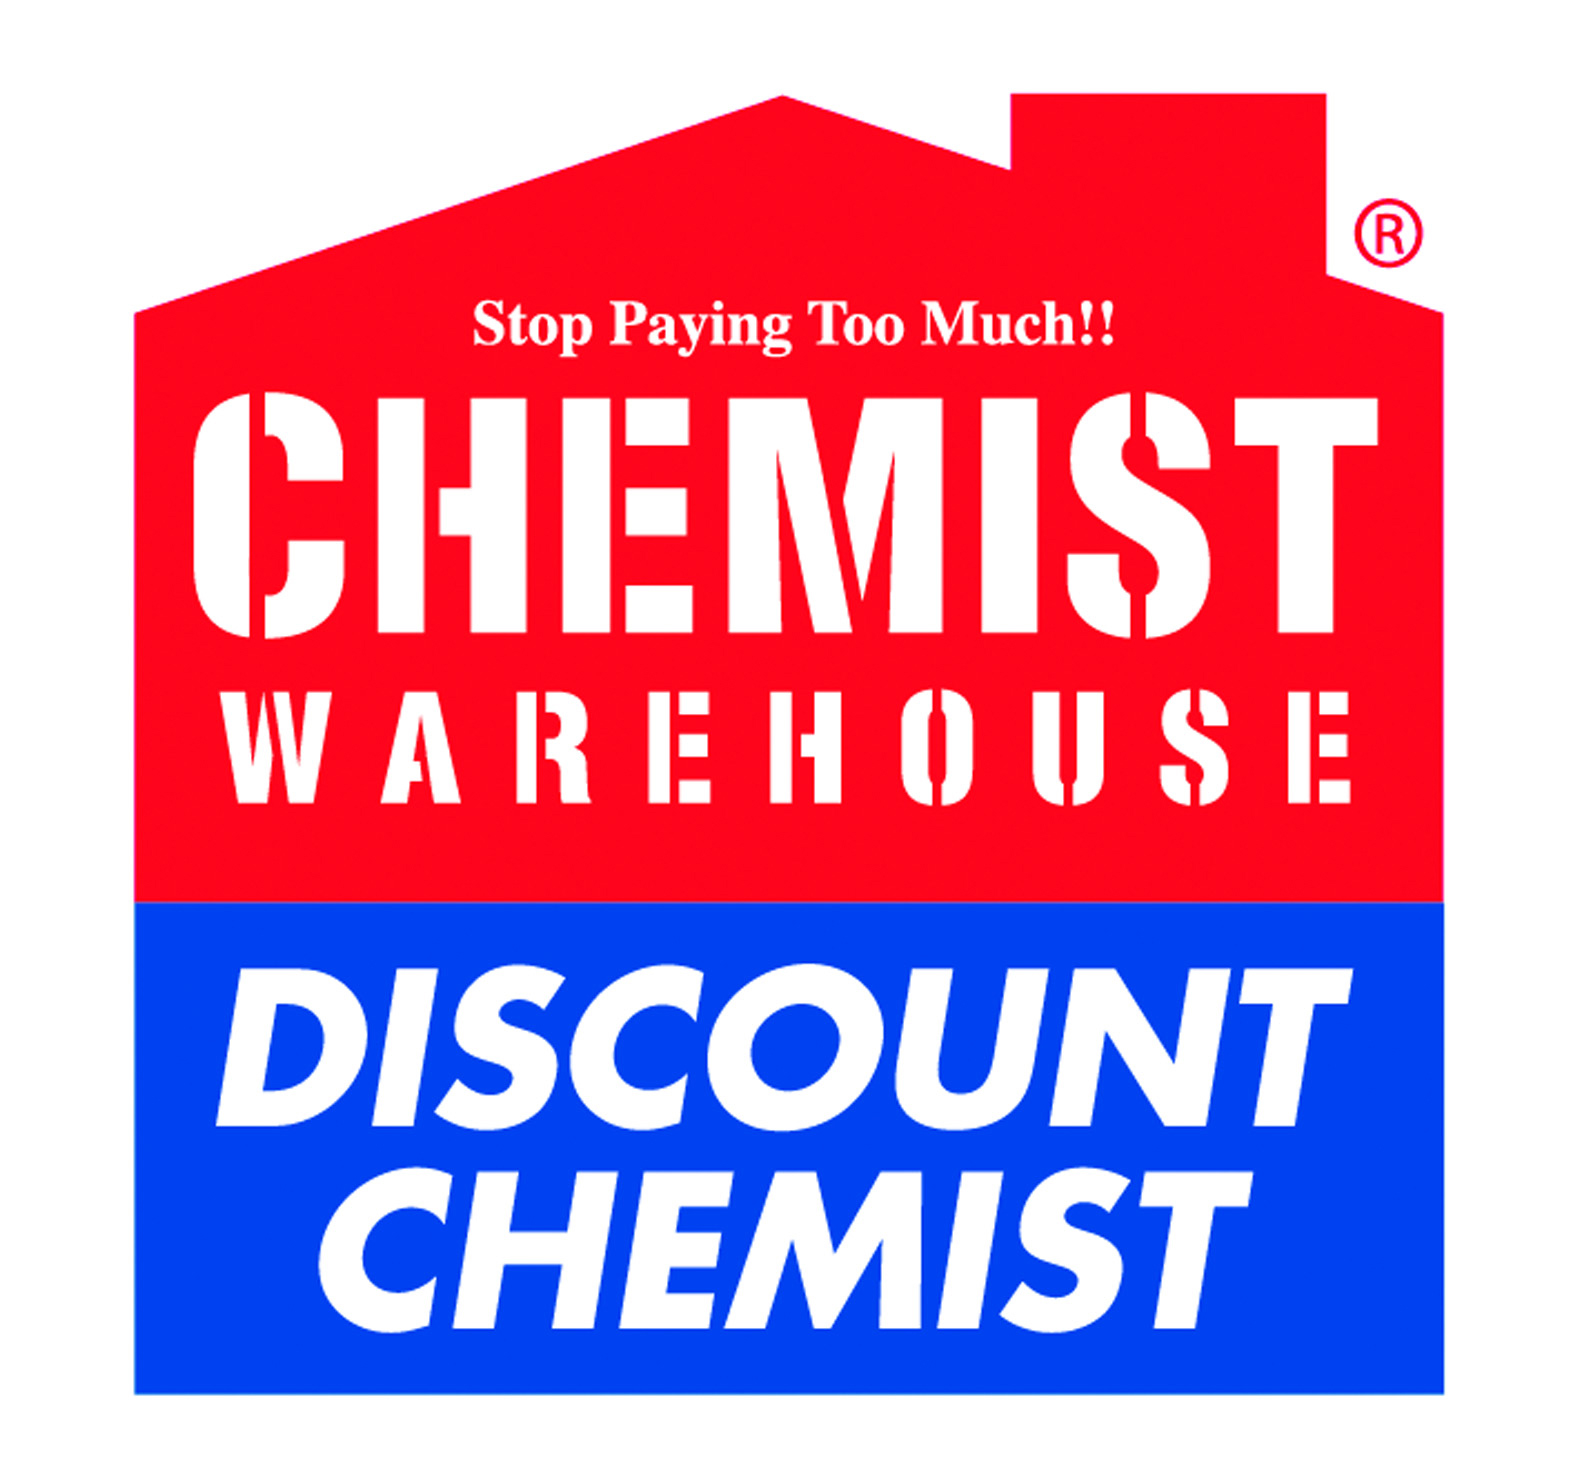 Chemist Warehouse selects Kofax TotalAgility platform to streamline Accounts Payable processes